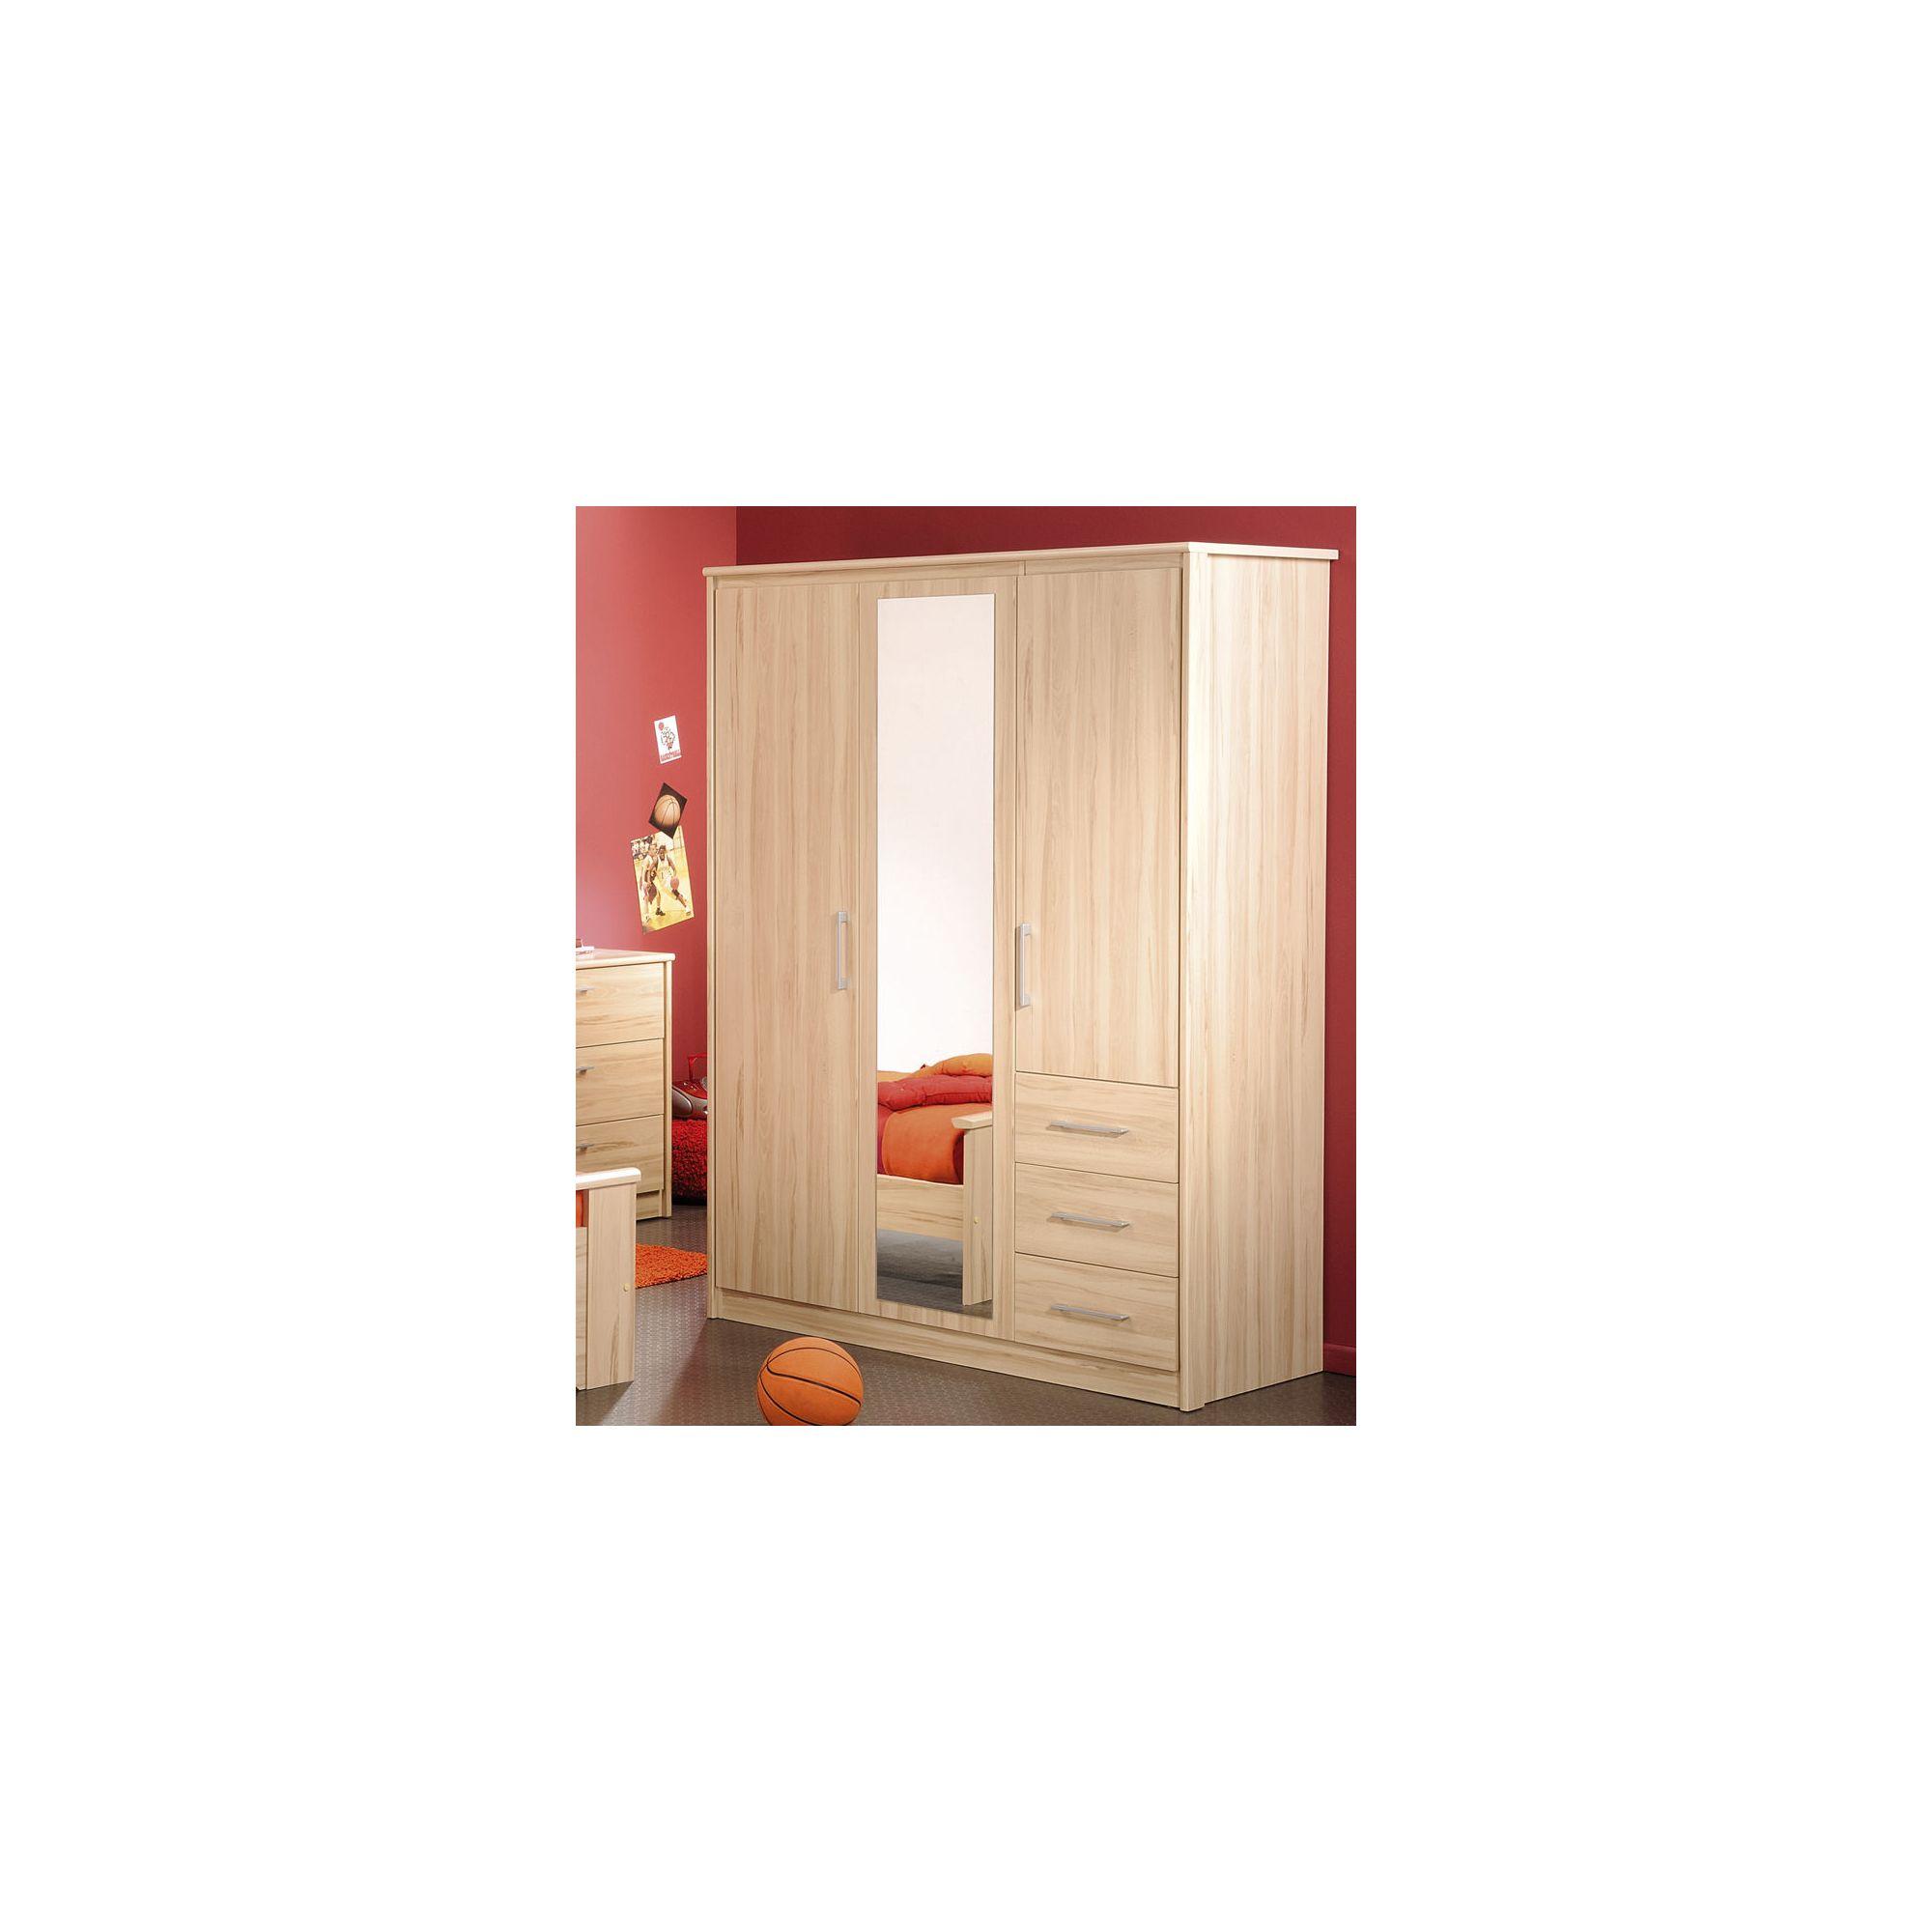 Parisot Kurt Three Door Wardrobe in Canyon Beech at Tesco Direct